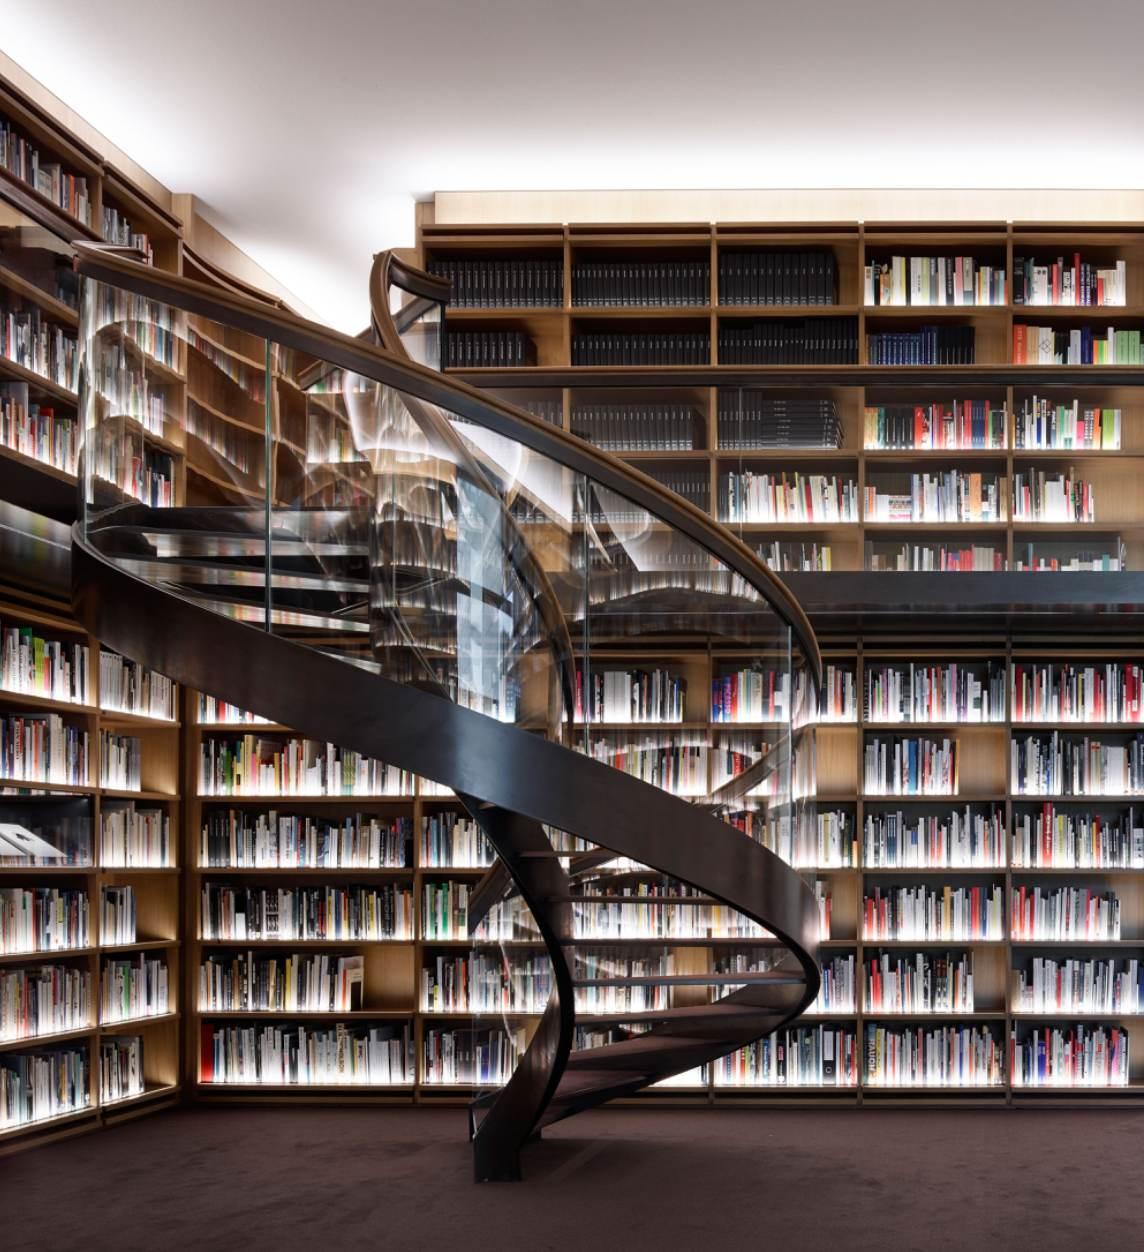 Muzeum Voorlinden w Holandii prezentujące sztukę nowoczesną